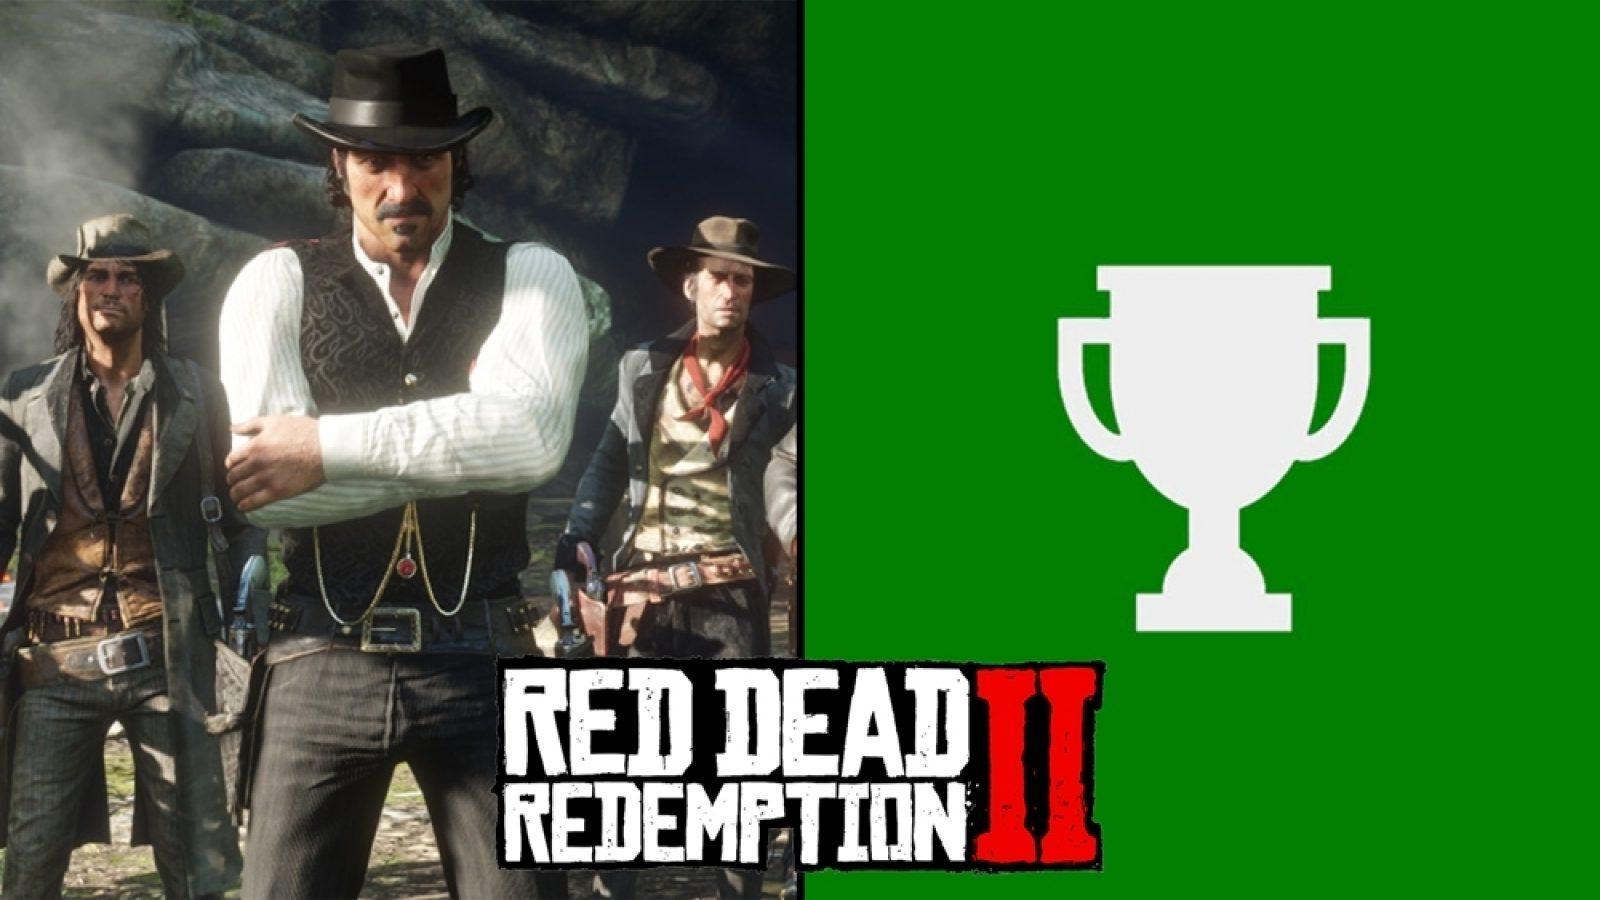 Guia completo passo a passo de troféus de Red Dead Redemption 2